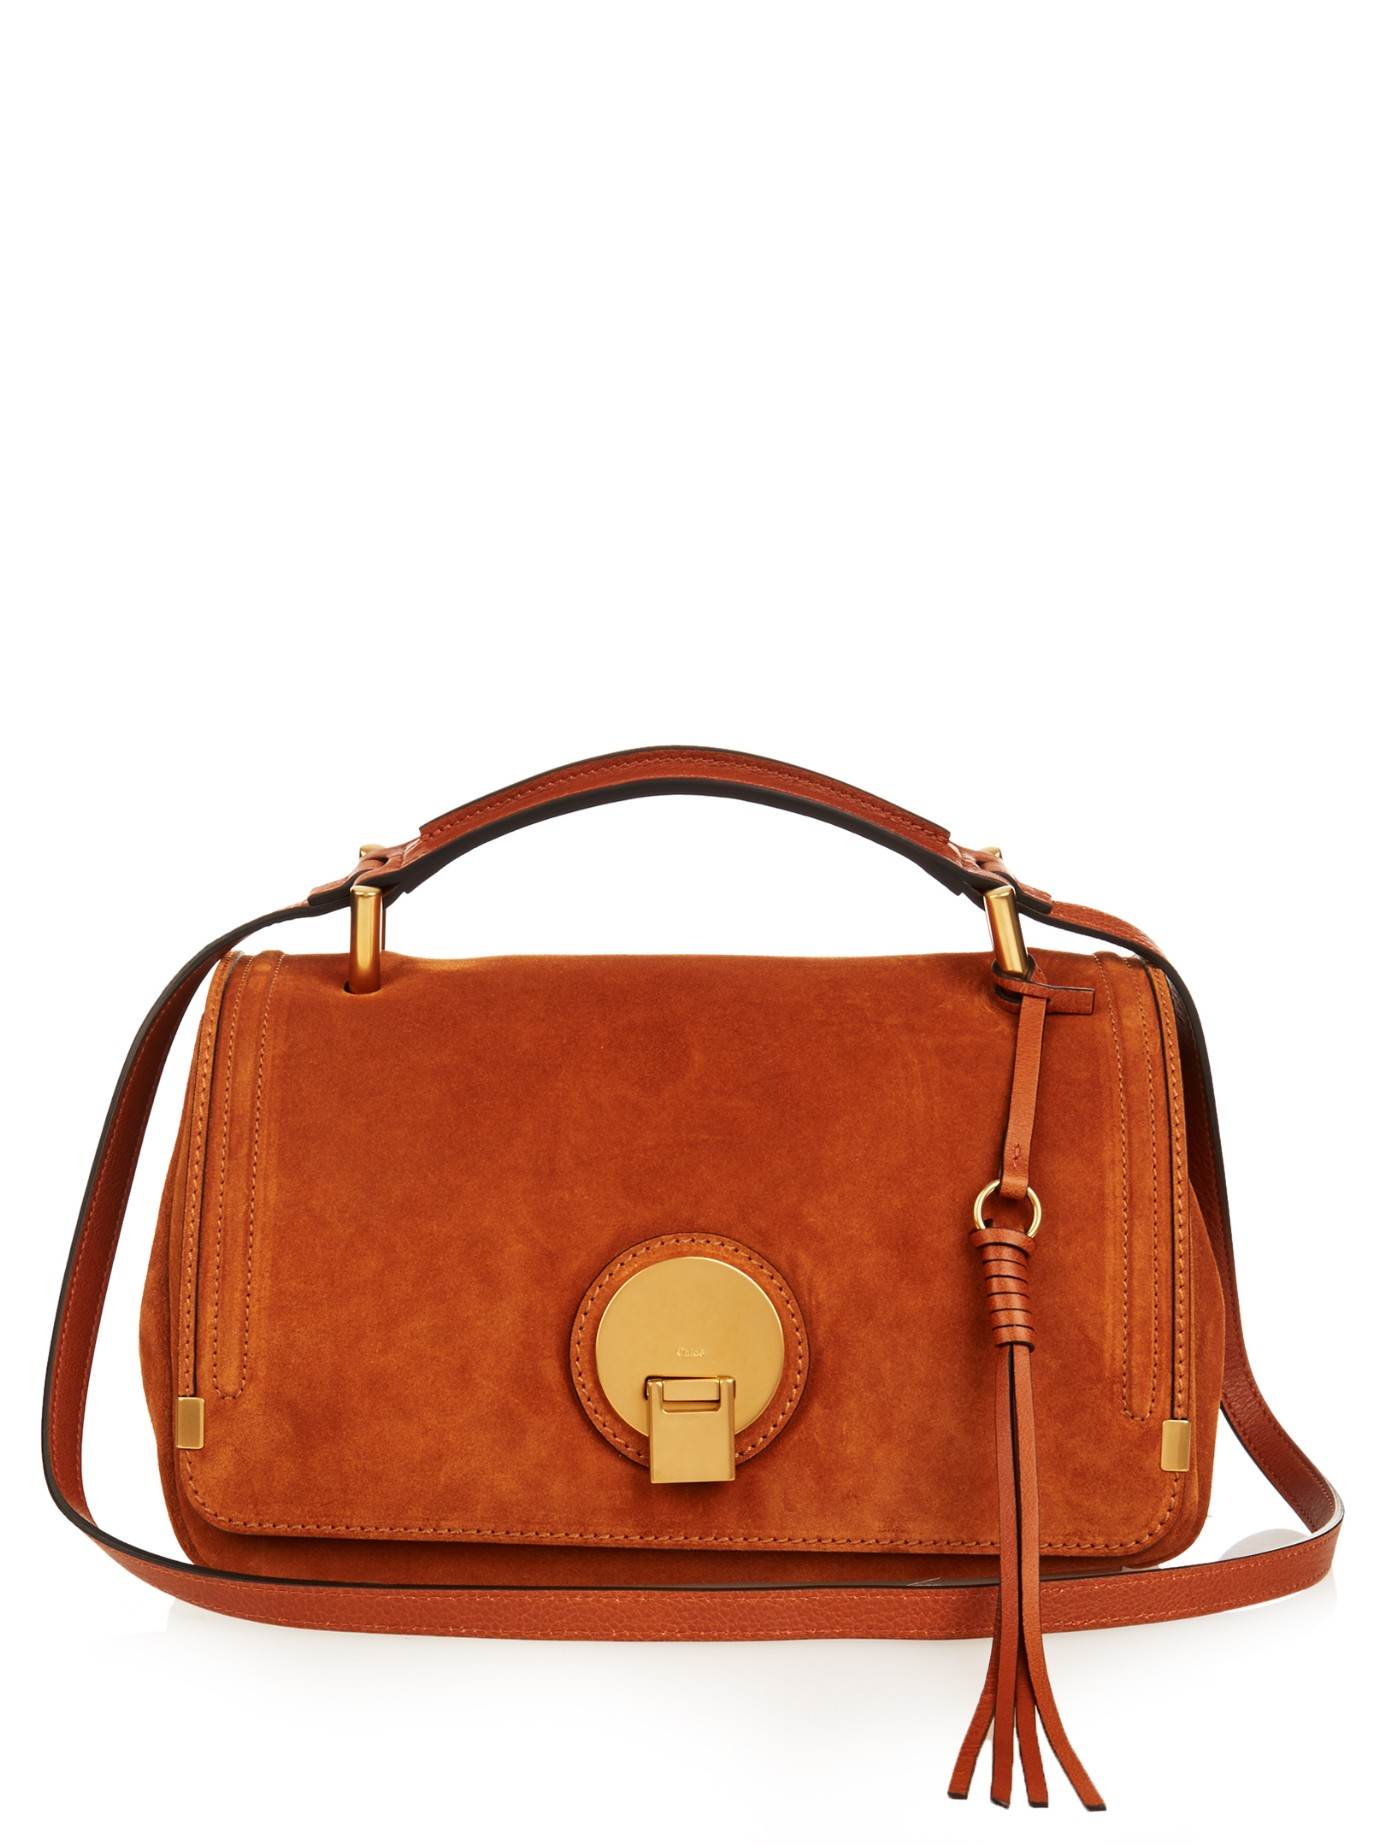 chloe marcie bag knockoff - indy bag in grained calfskin